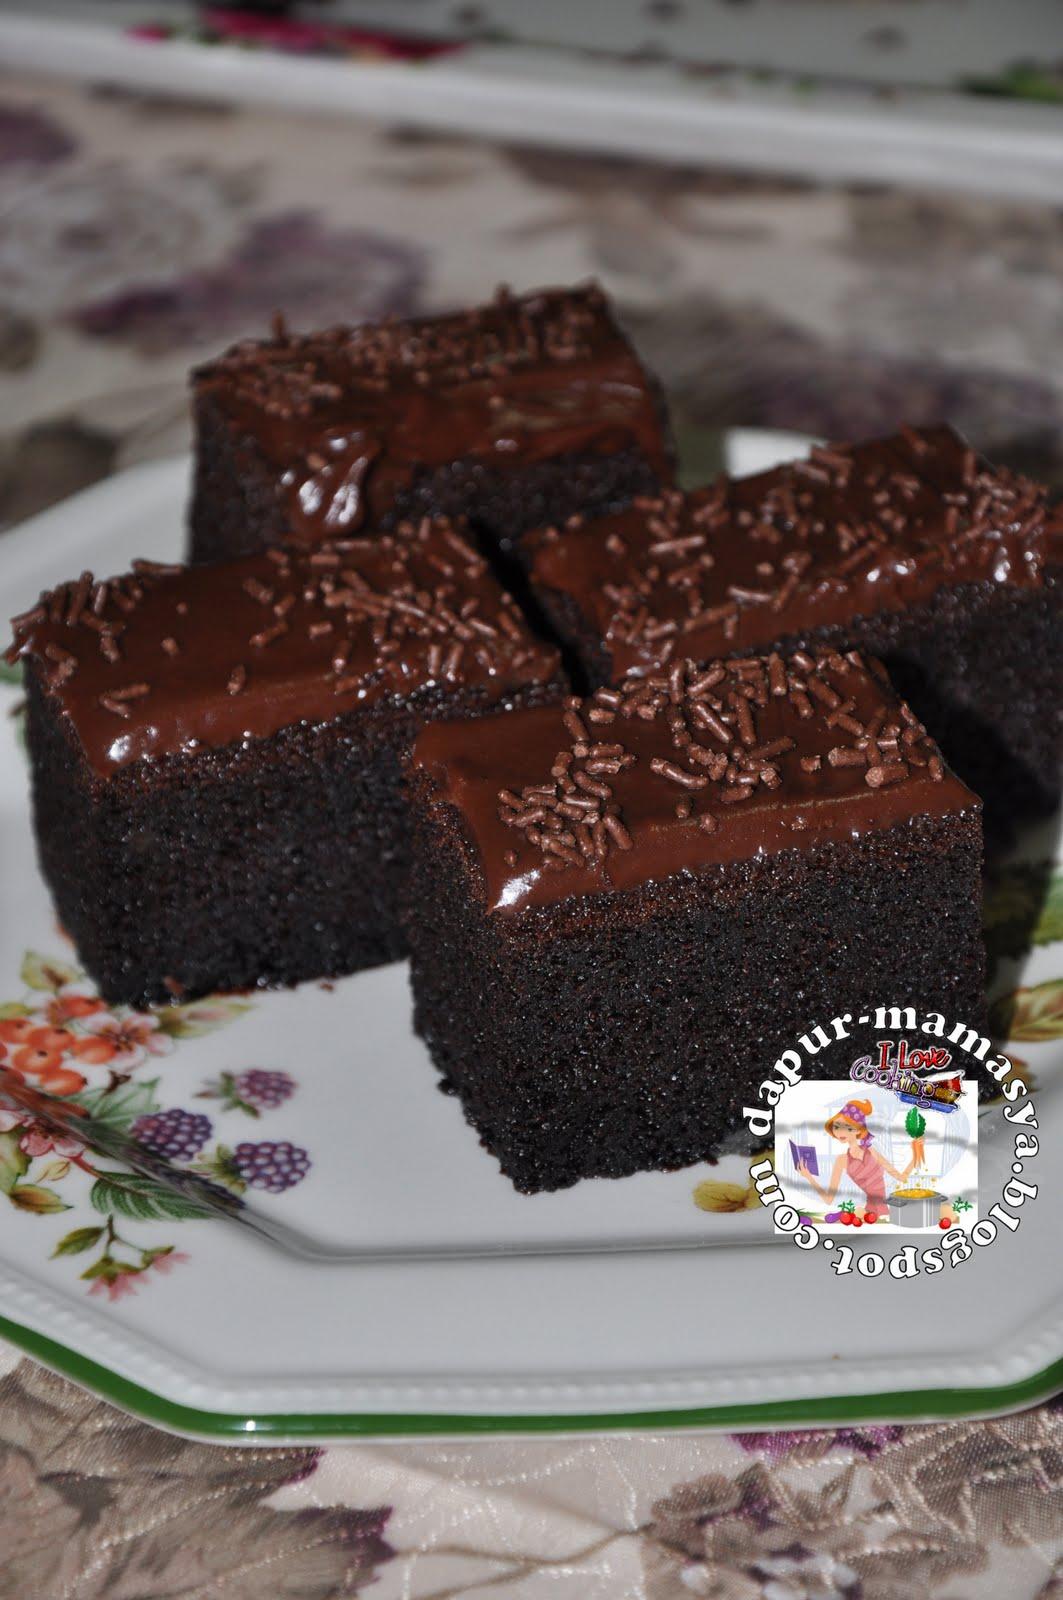 resepi brownies minyak surat rasmi Resepi Kek Coklat Sukatan Cawan Enak dan Mudah